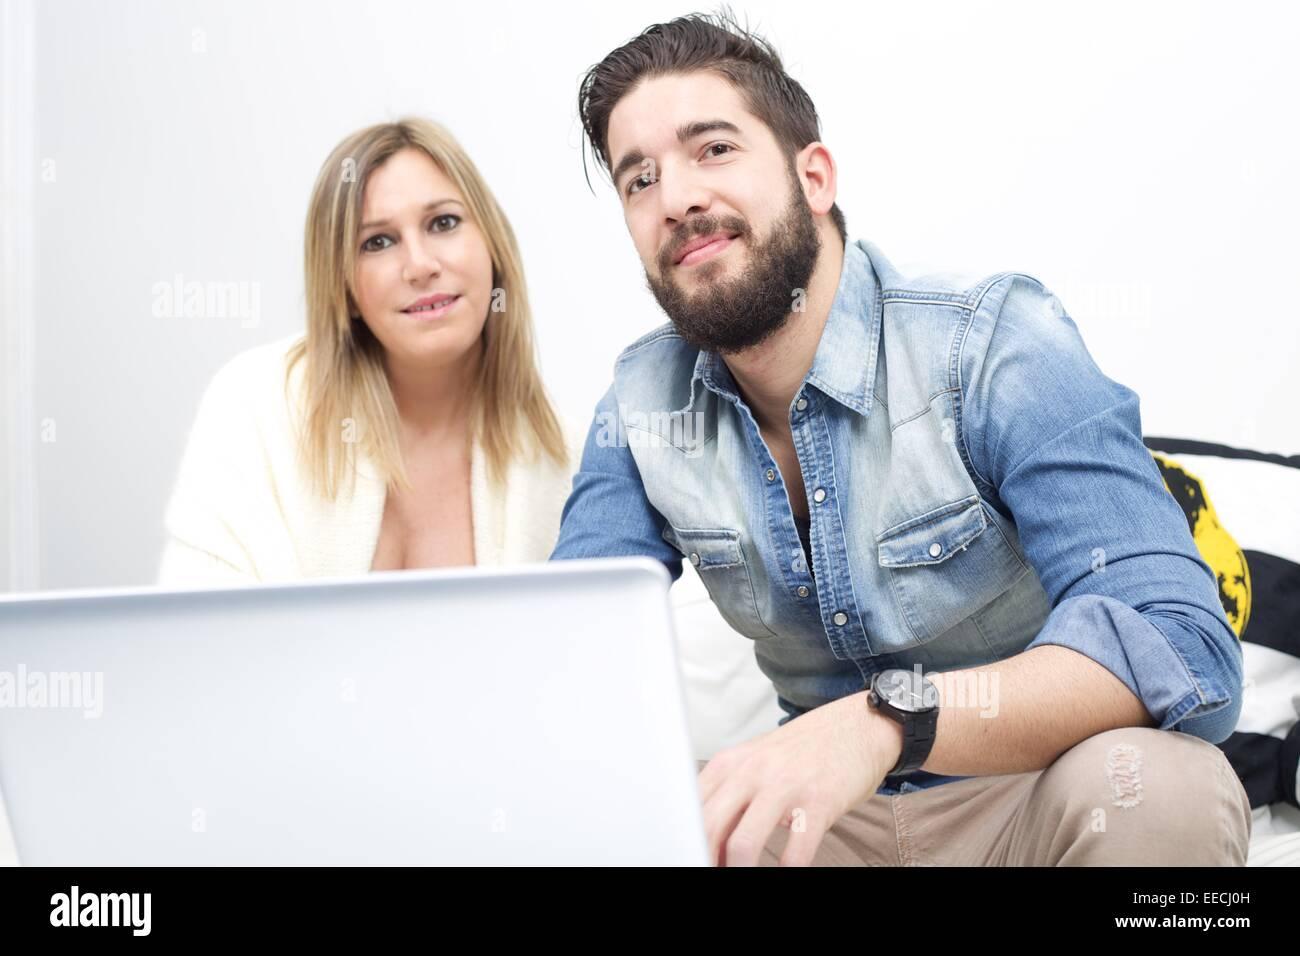 couple using laptop - Stock Image